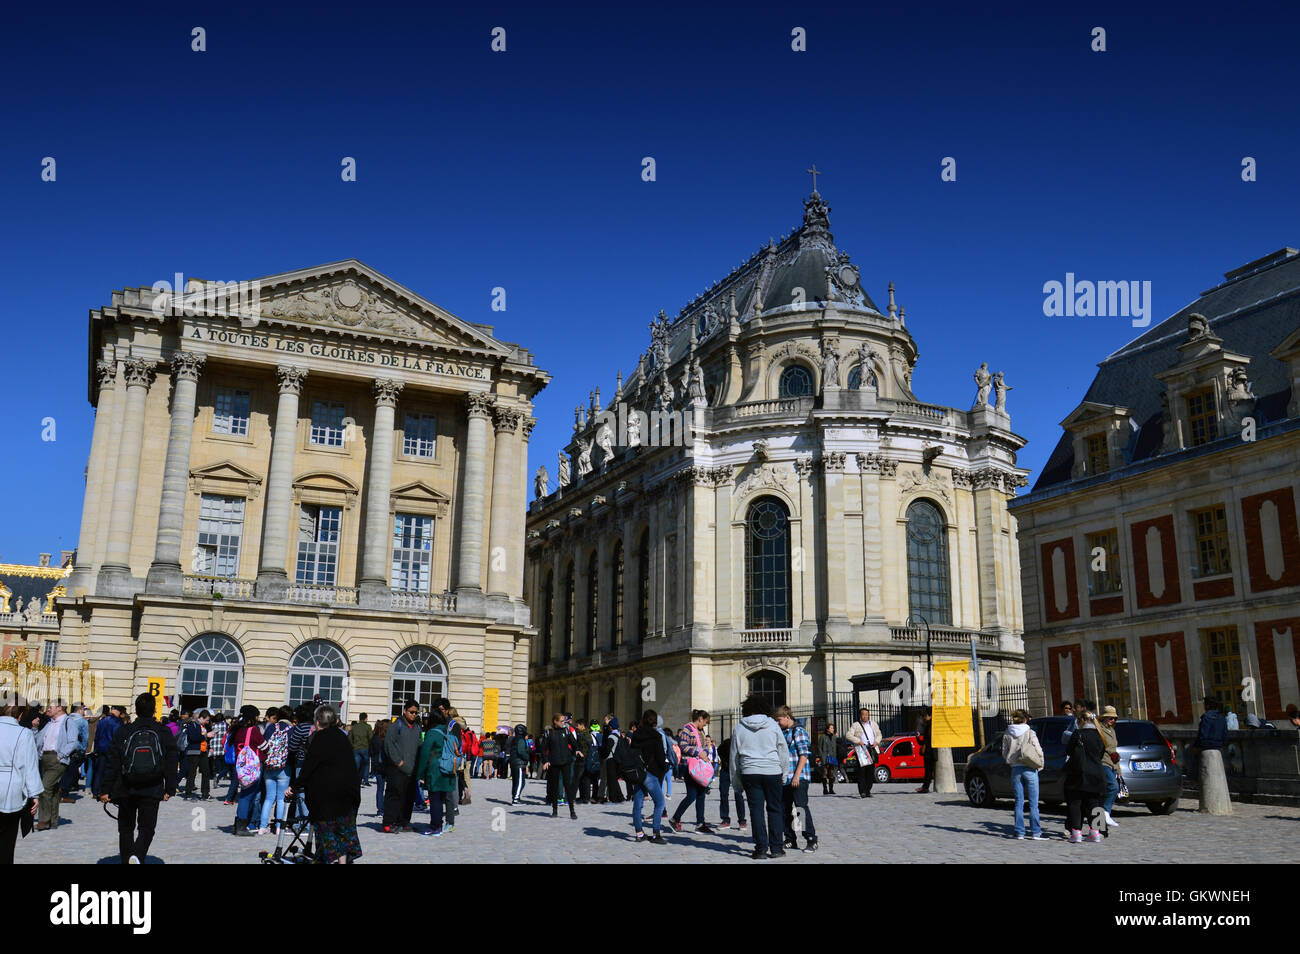 VERSAILLES, Frankreich - 19. April 2015: Touristen warten auf den Palast von Versailles, Frankreich zu betreten Stockbild